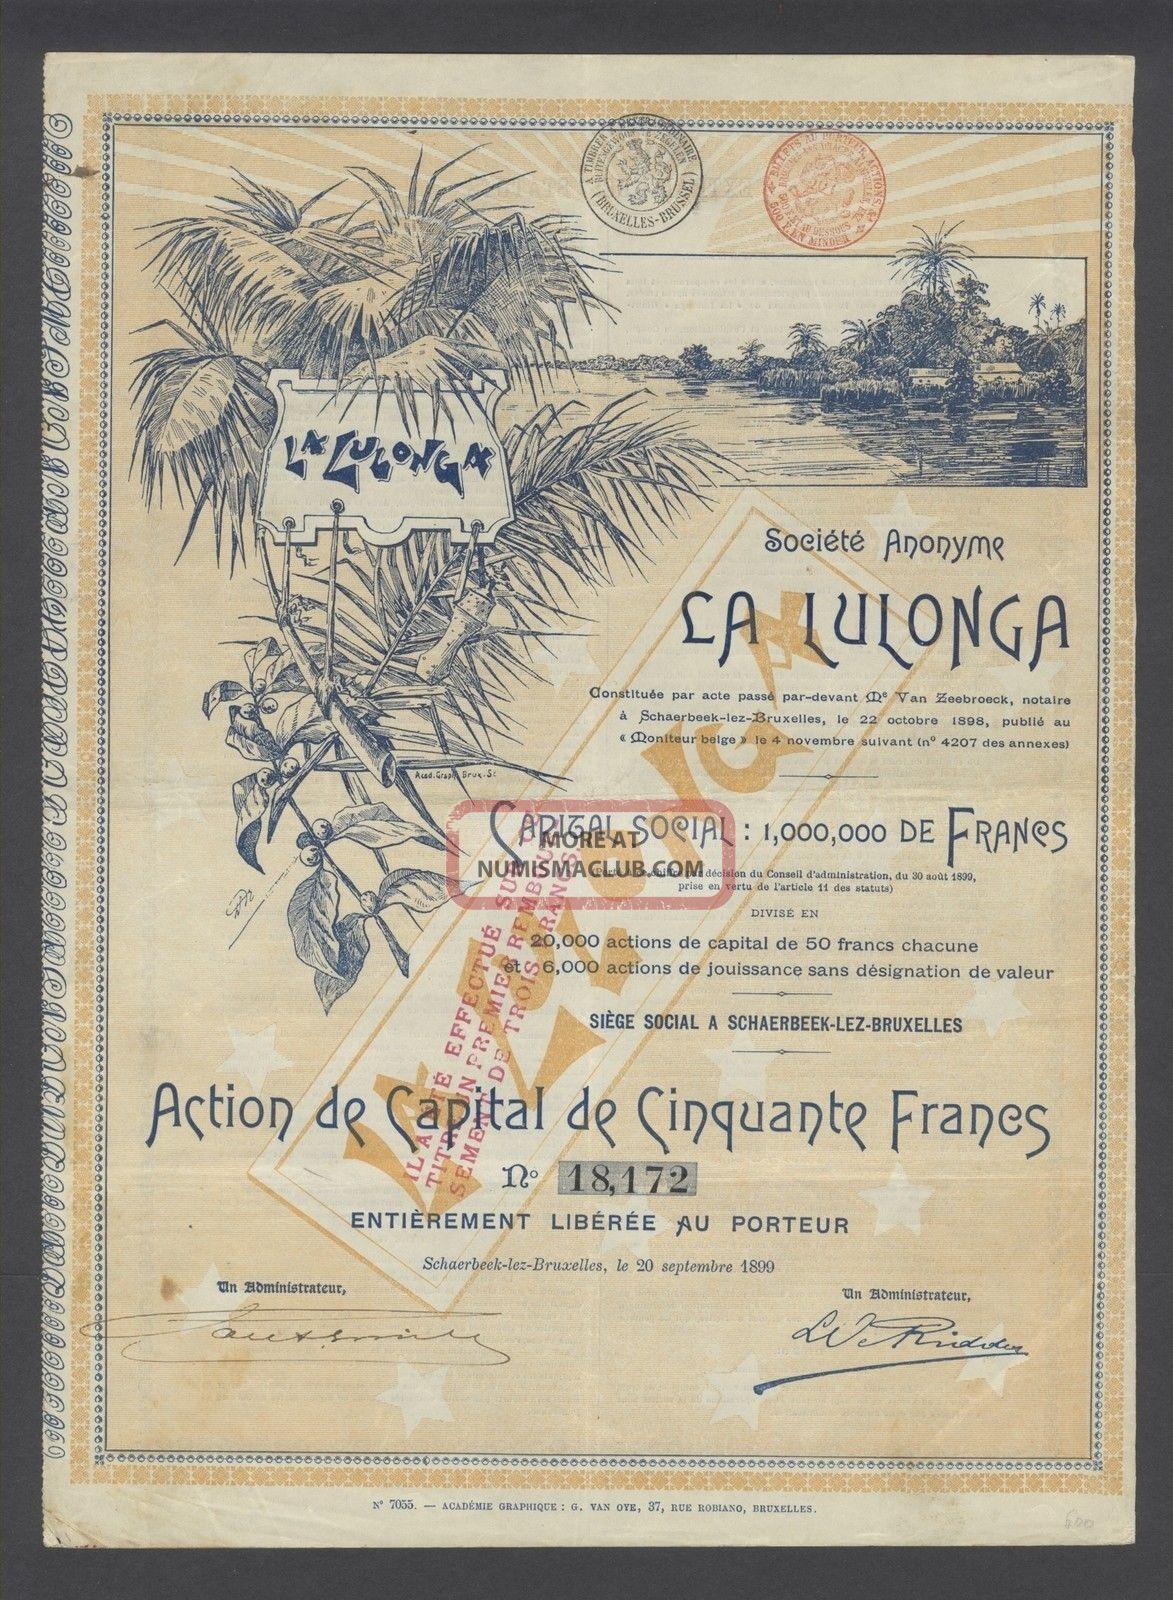 Belgium 1899 Illustrated Bond - La Lulonga Schaerbeek. . .  A9758 World photo